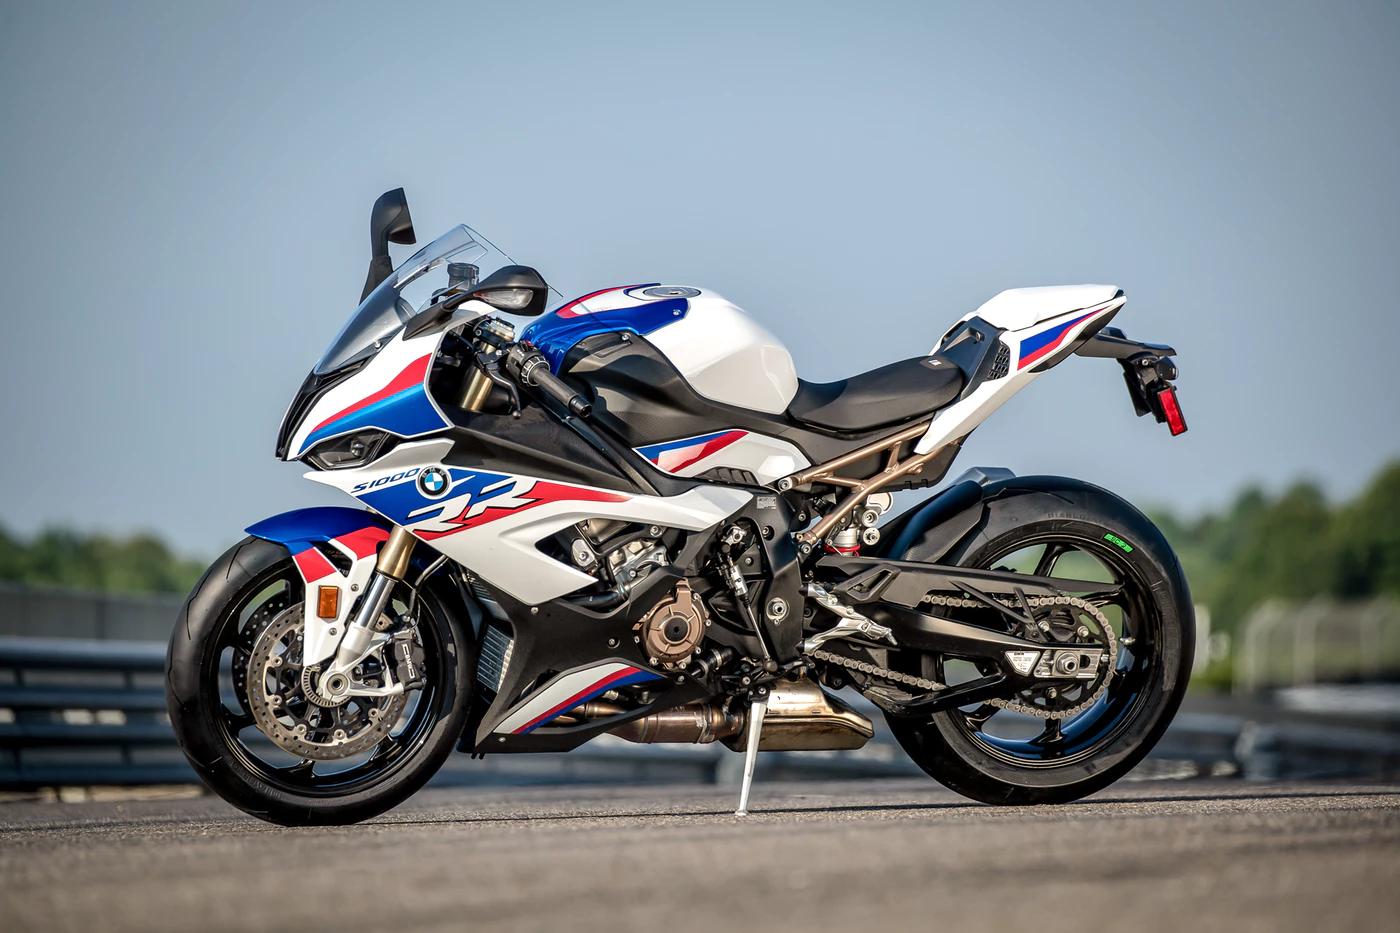 2020 Bmw S 1000 Rr First Ride Review Revzilla Bmw S Bmw S1000rr Bmw